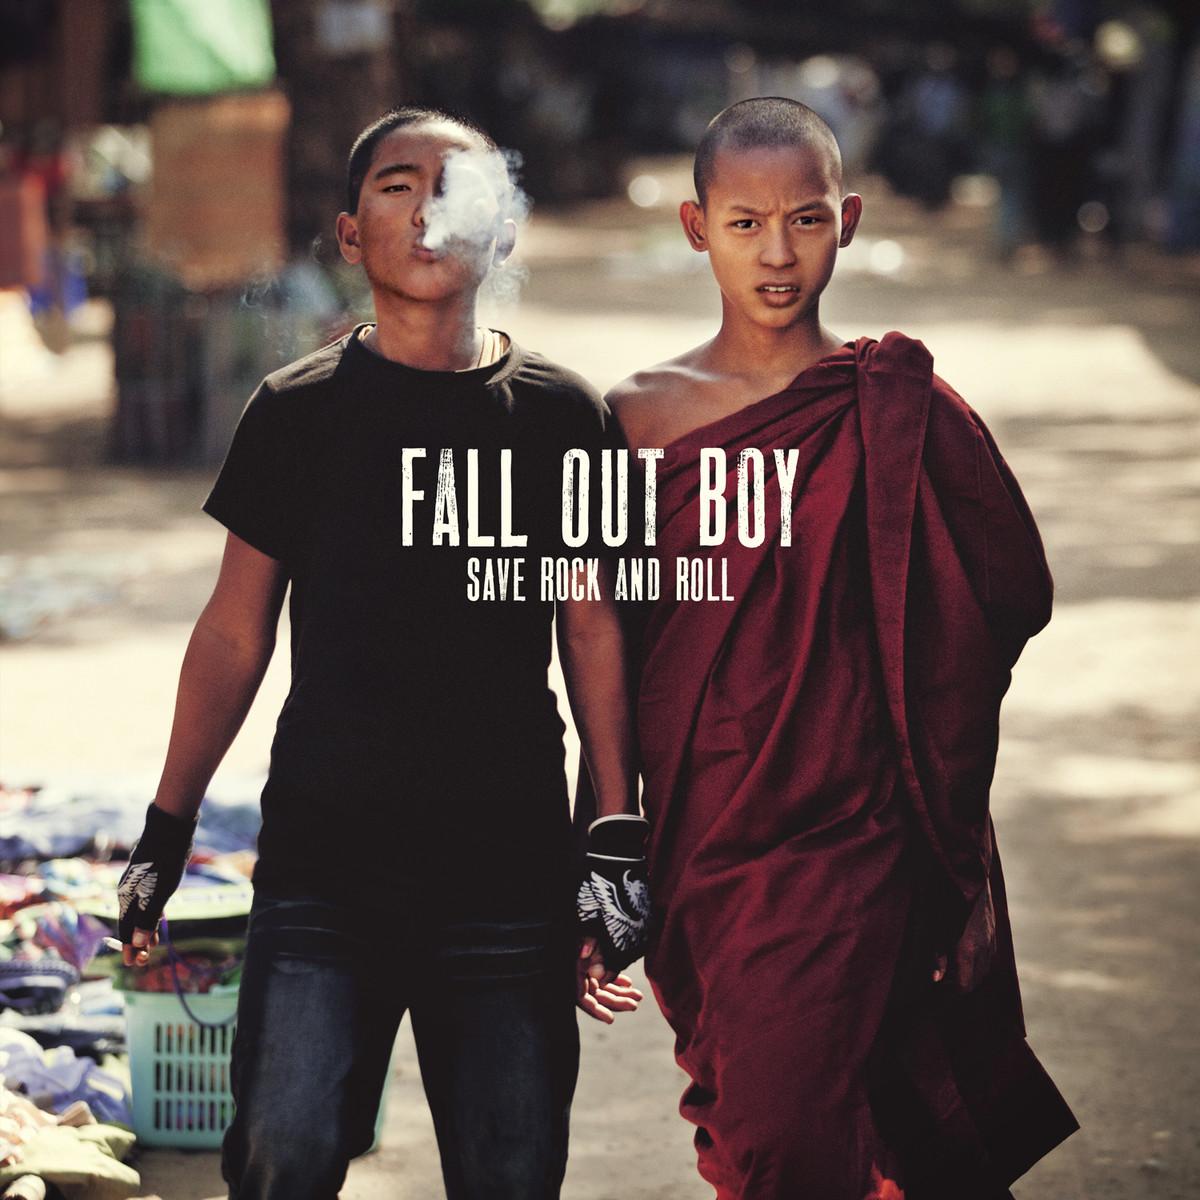 fall out boy热单_The Phoenix_Fall Out Boy_高音质在线试听_The Phoenix歌词|歌曲下载_酷狗音乐